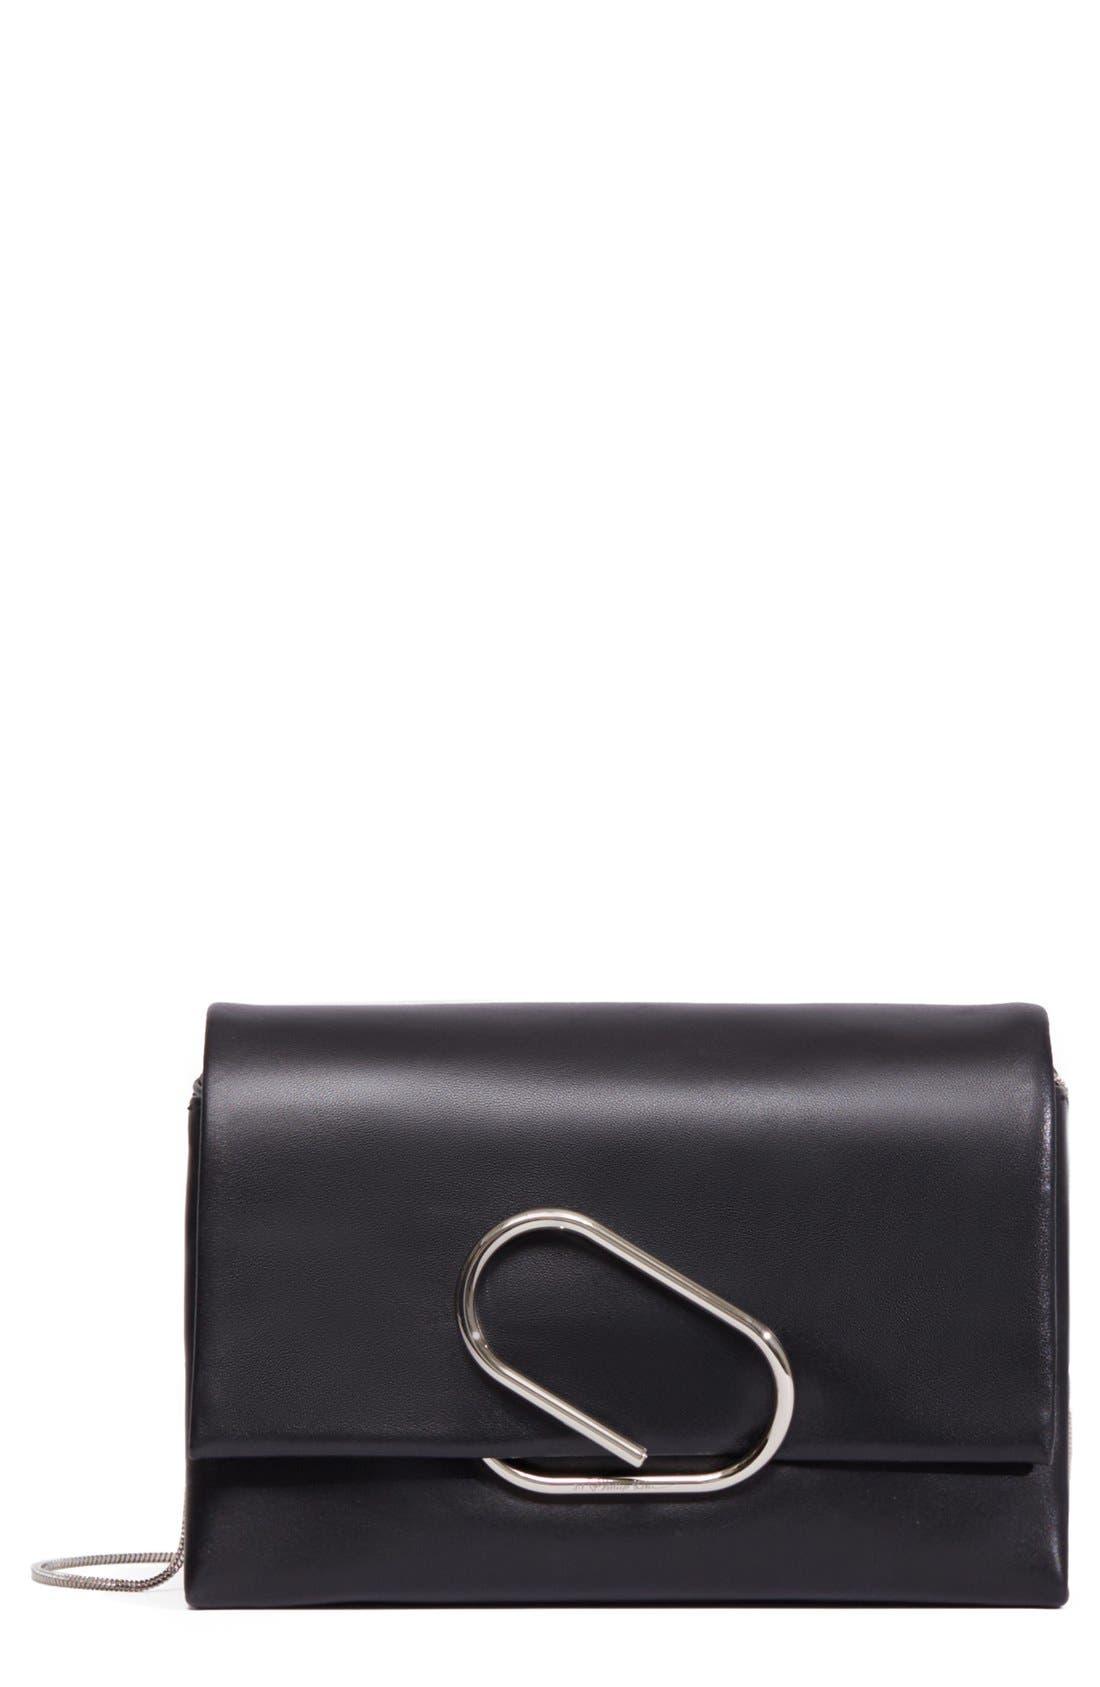 3.1 Phillip Lim 'Alix' Leather Clutch